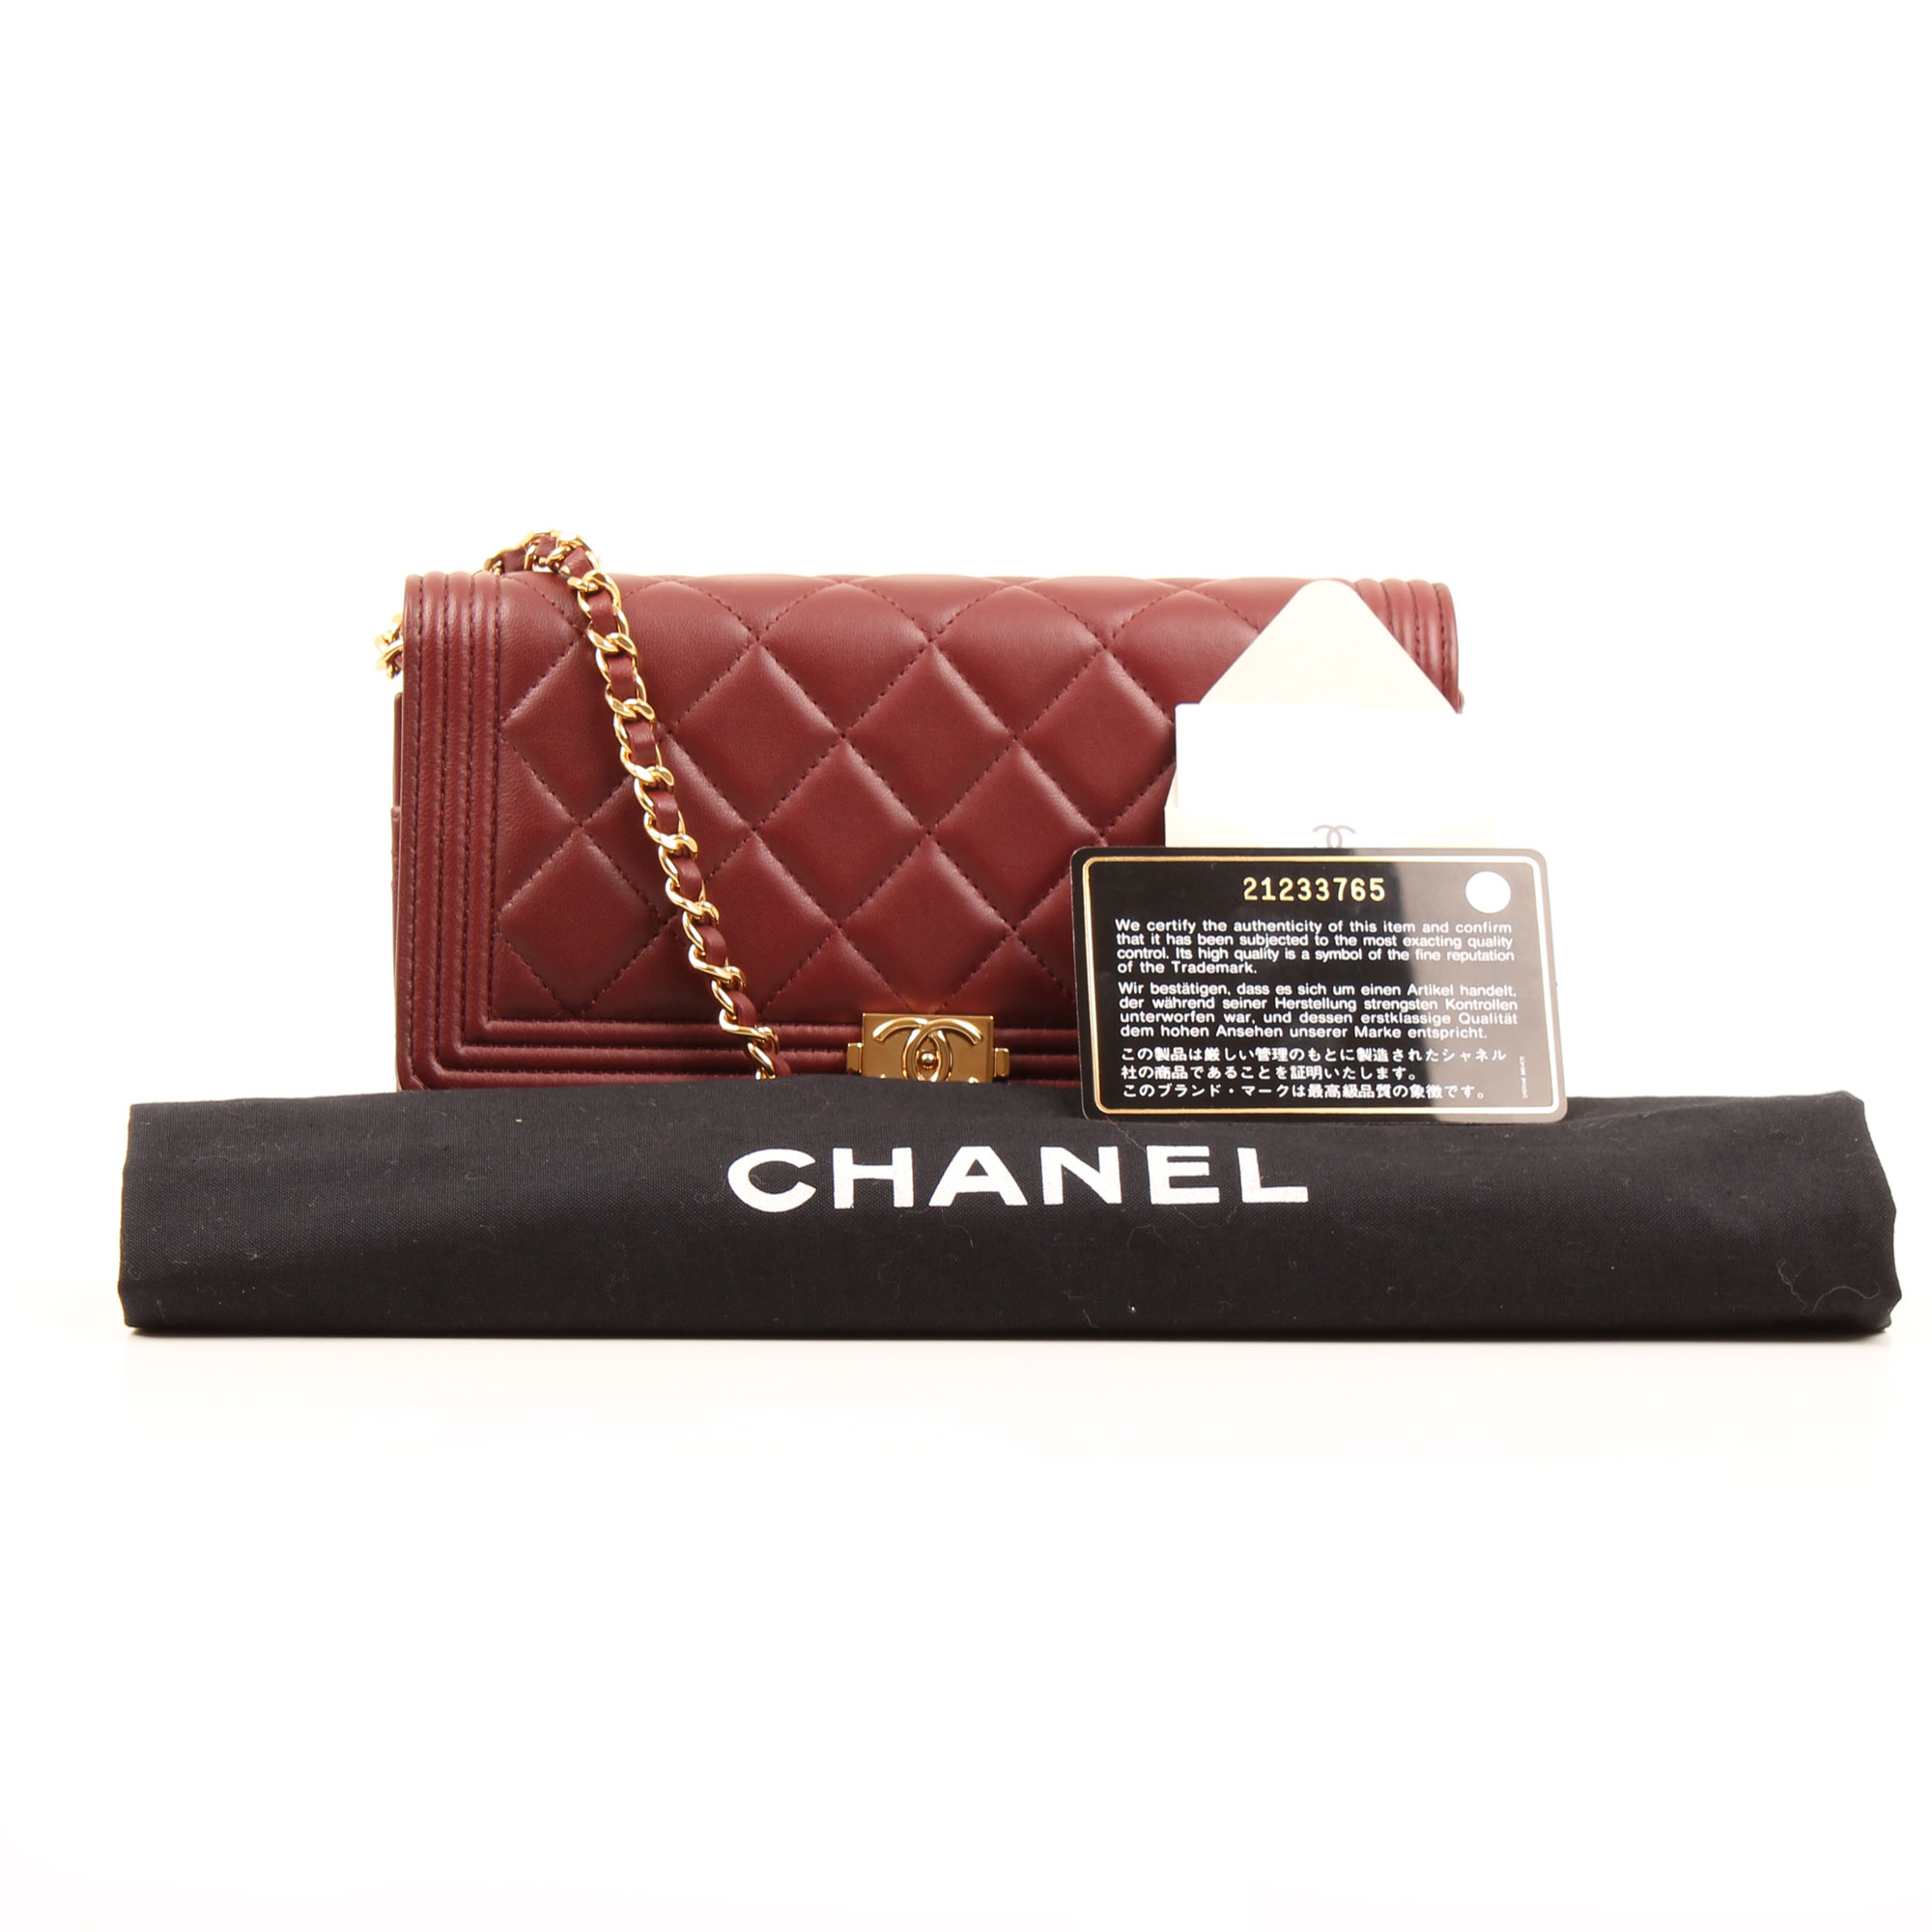 Imagen del bolso del bolso chanel woc boy terracota